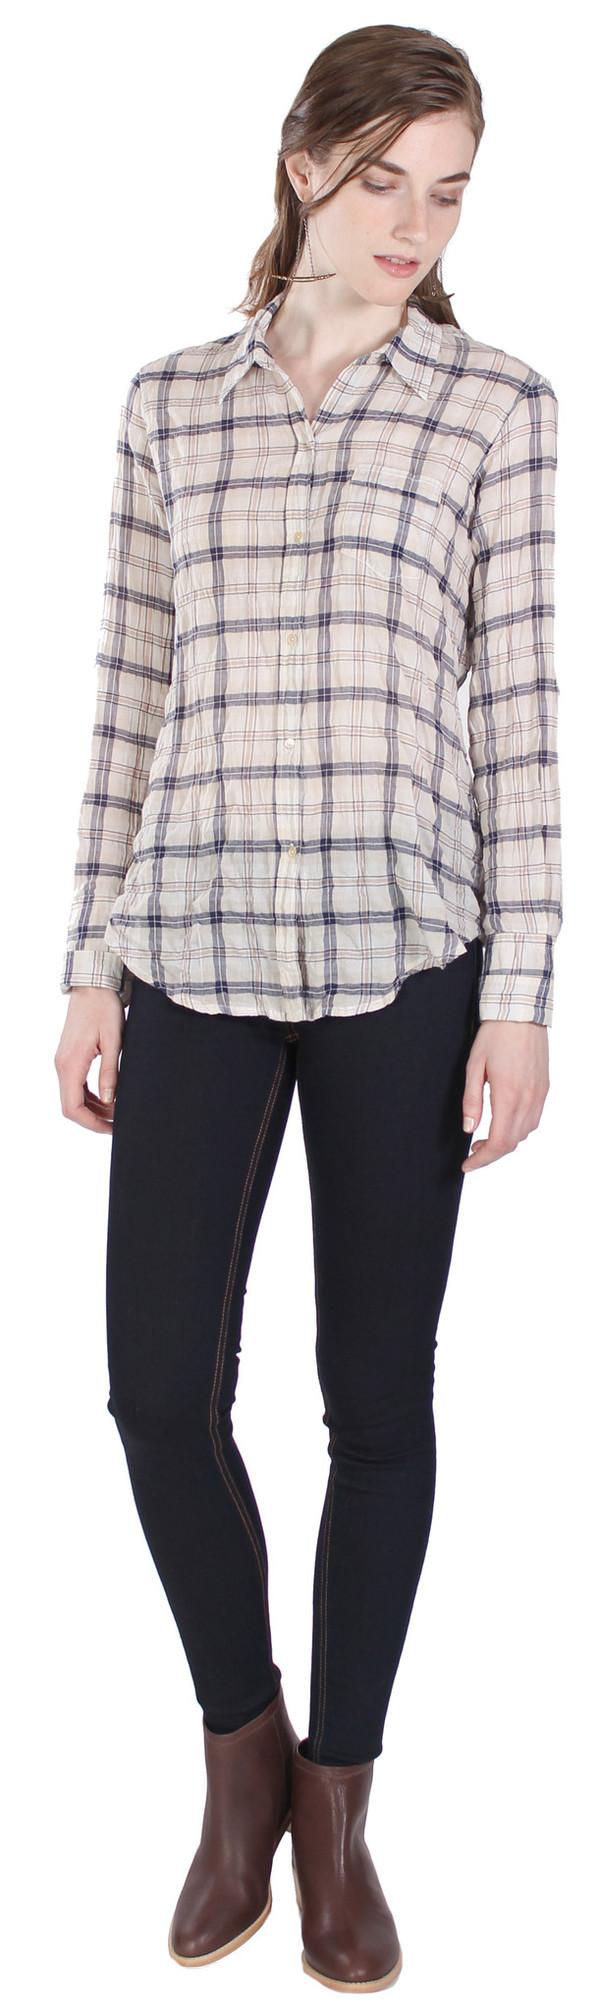 Nili Lotan Shirt Indigo Stripe in Multi